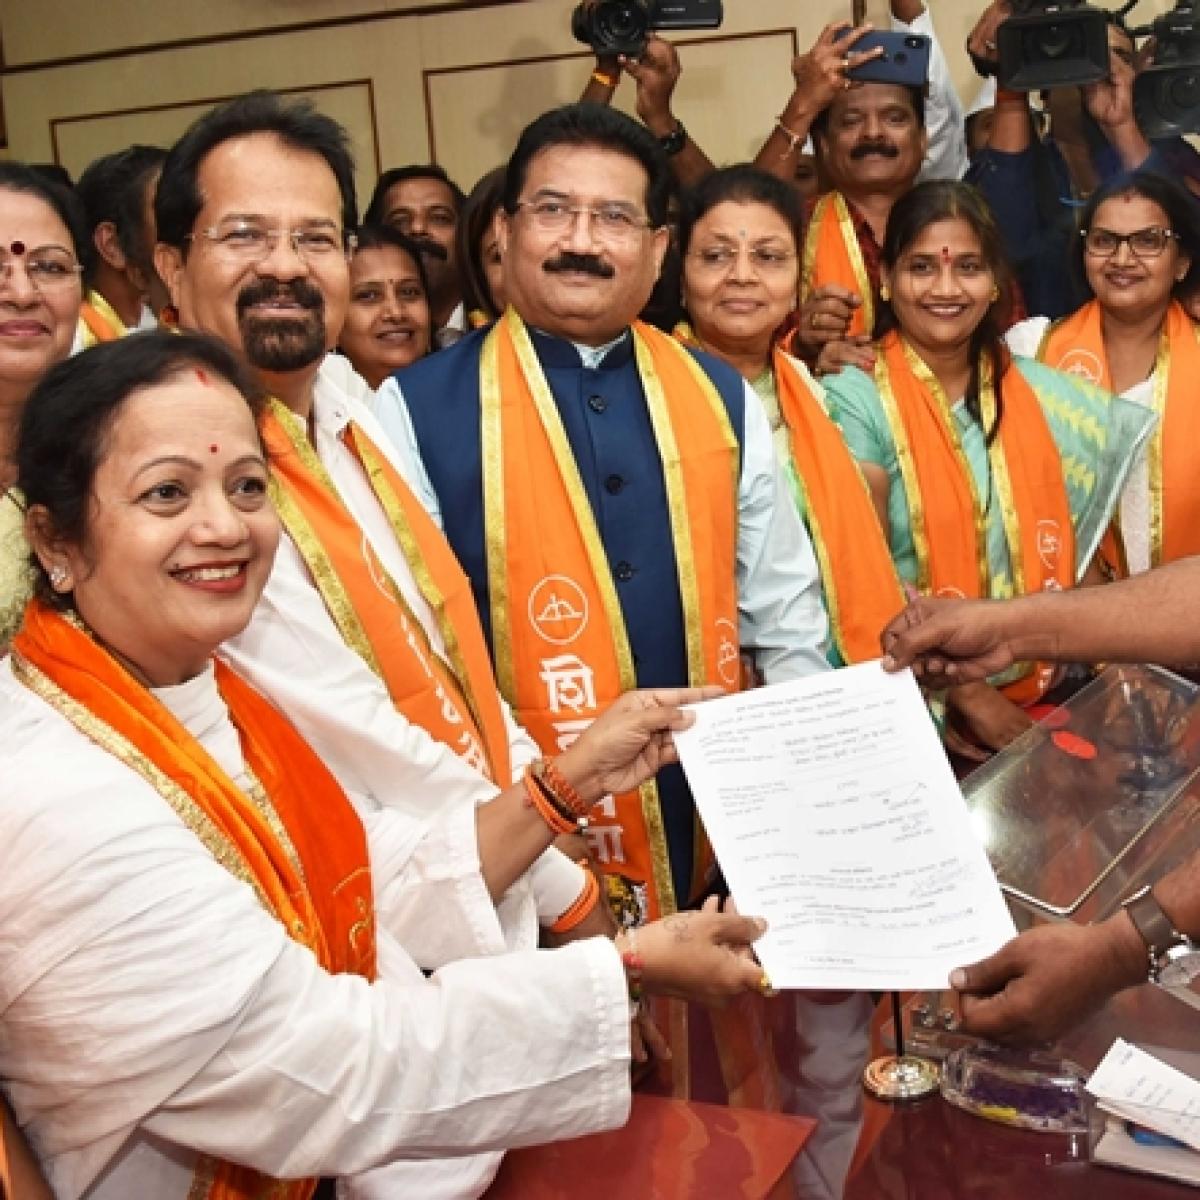 Mayoral election: Unopposed, Shiv Sena set to sail through